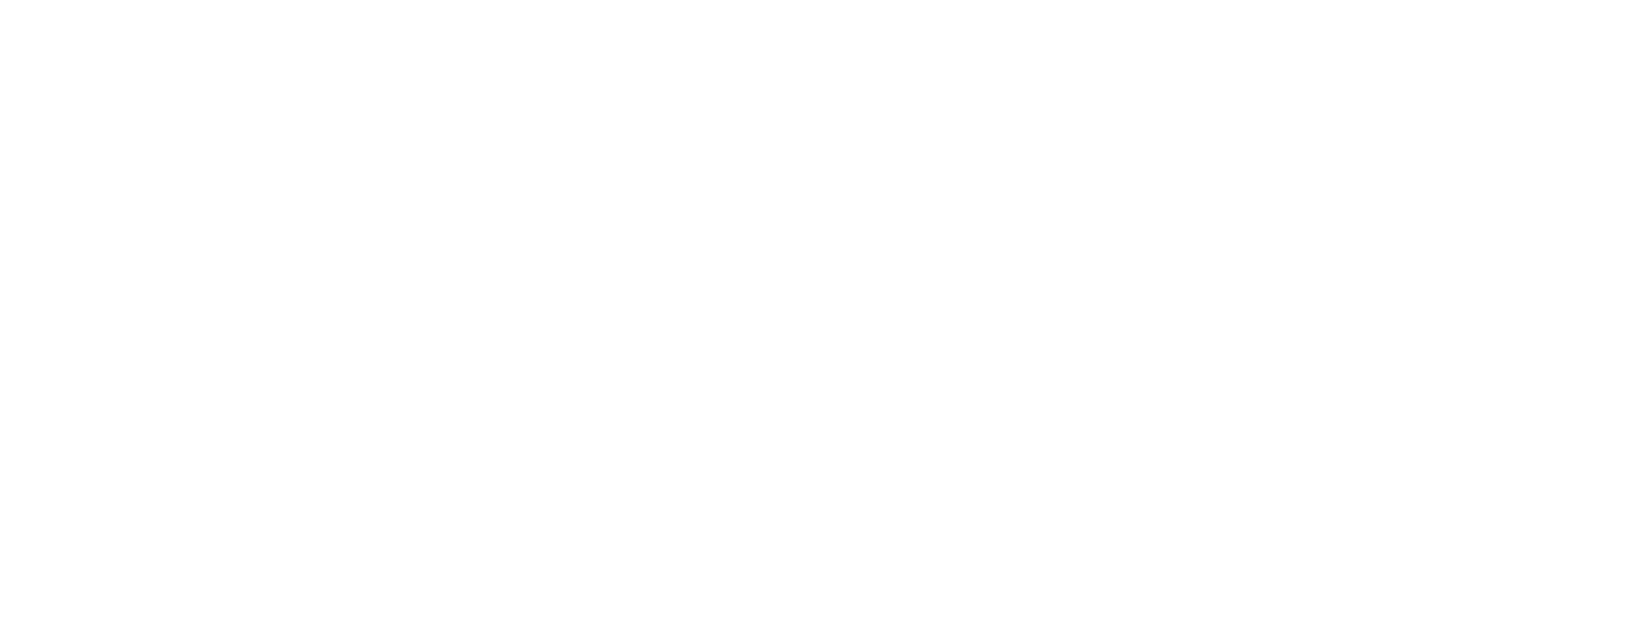 skels-logo-white-on-trans